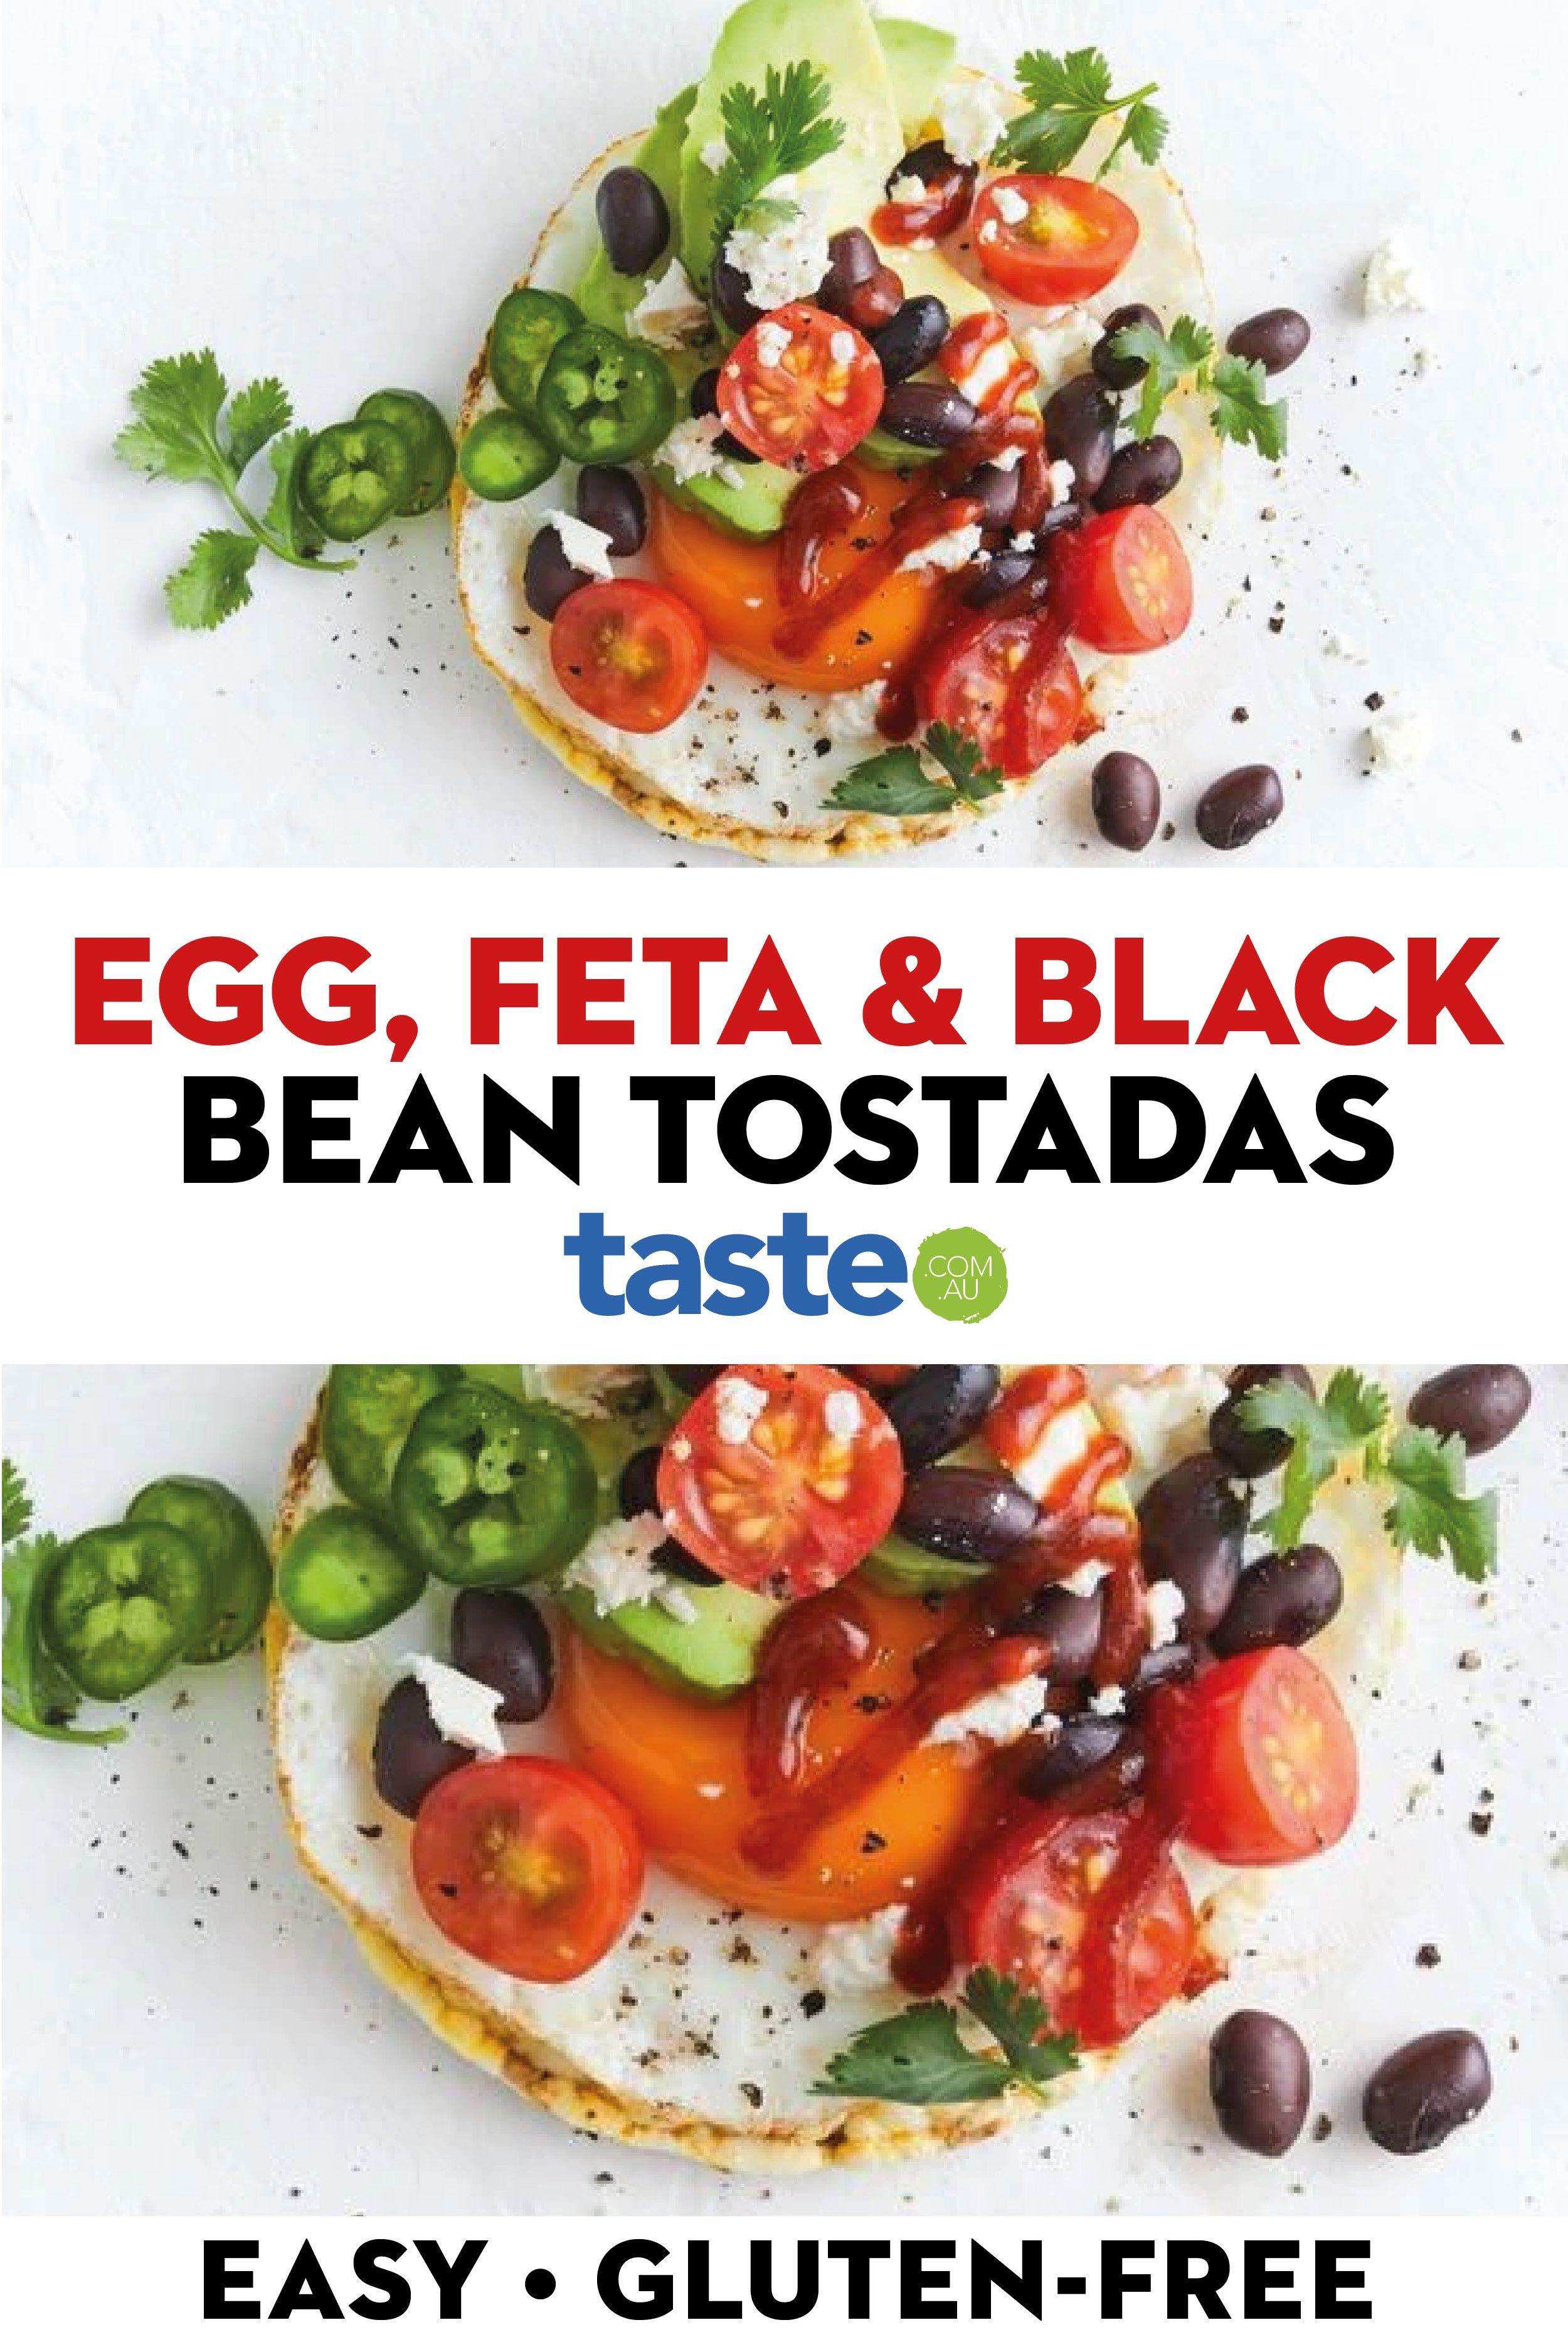 Easy Egg Feta And Black Bean Tostadas Recipe In 2020 Recipes Cooking Recipes Vegetarian Recipes